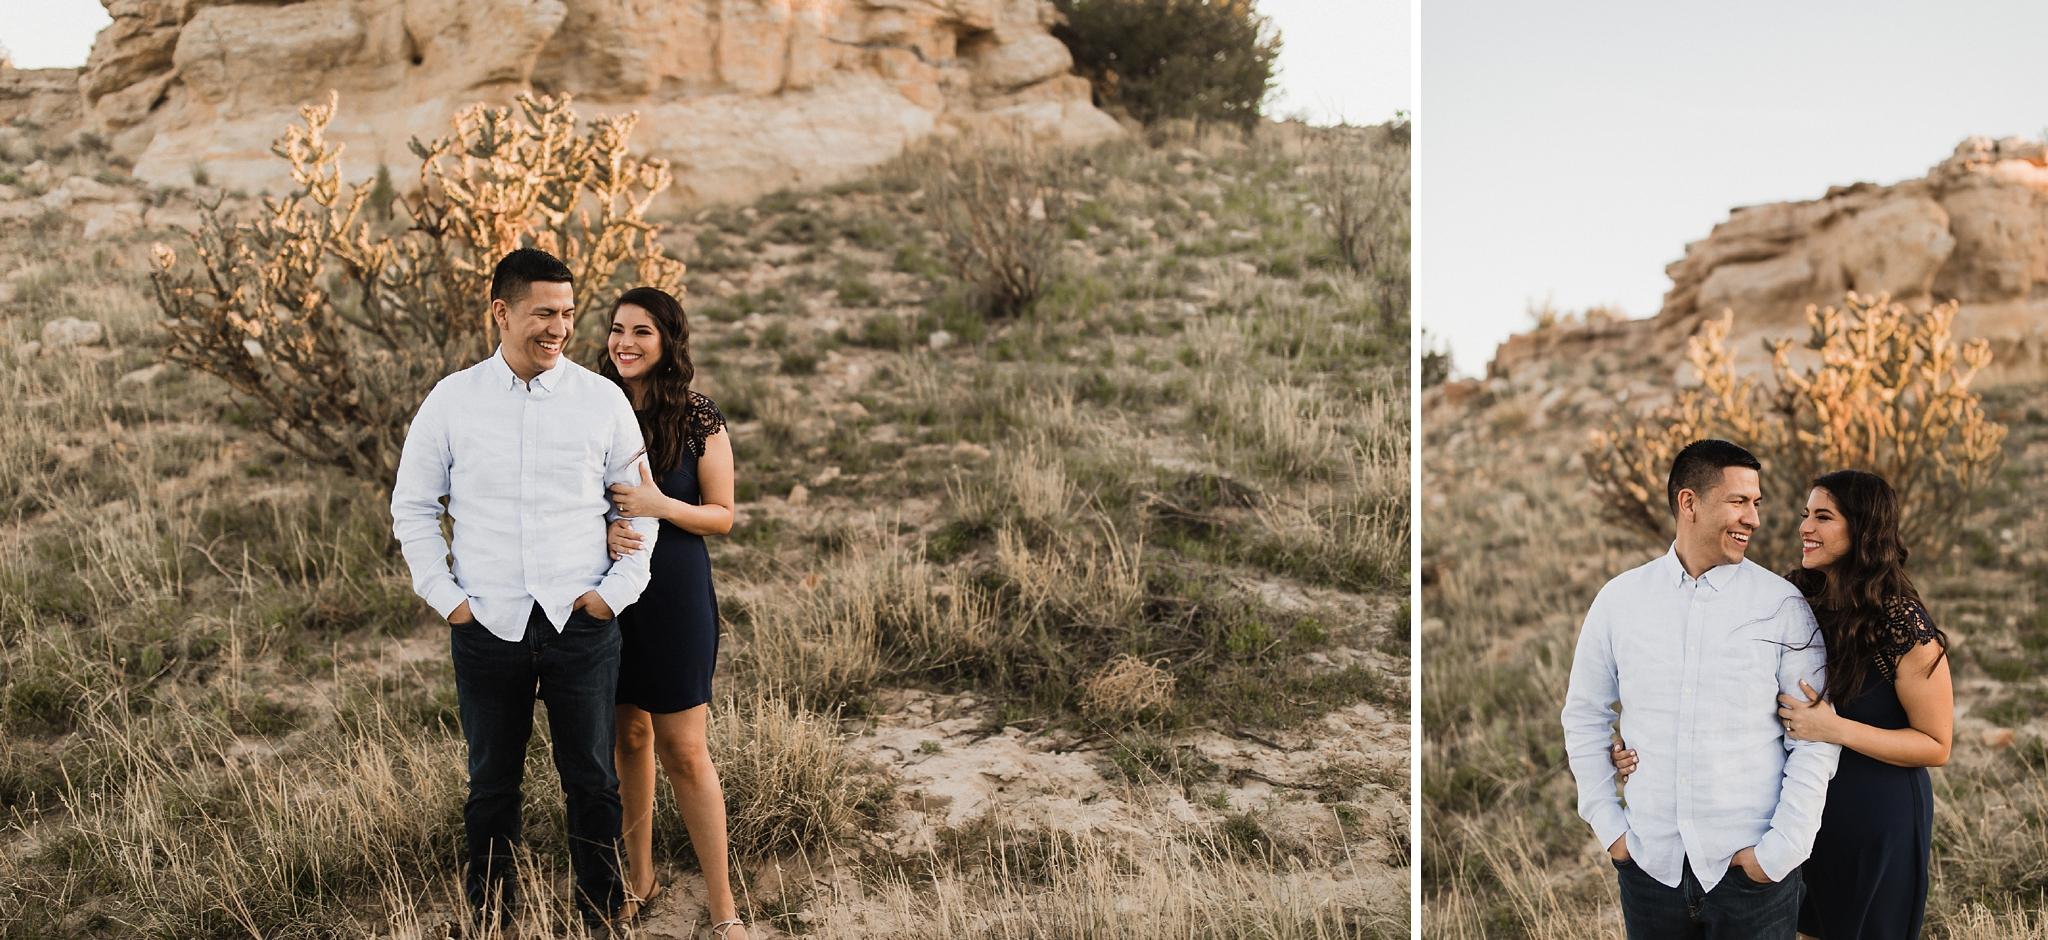 Alicia+lucia+photography+-+albuquerque+wedding+photographer+-+santa+fe+wedding+photography+-+new+mexico+wedding+photographer+-+new+mexico+wedding+-+new+mexico+engagement+-+white+mesa+engagement+-+desert+engagement_0024.jpg